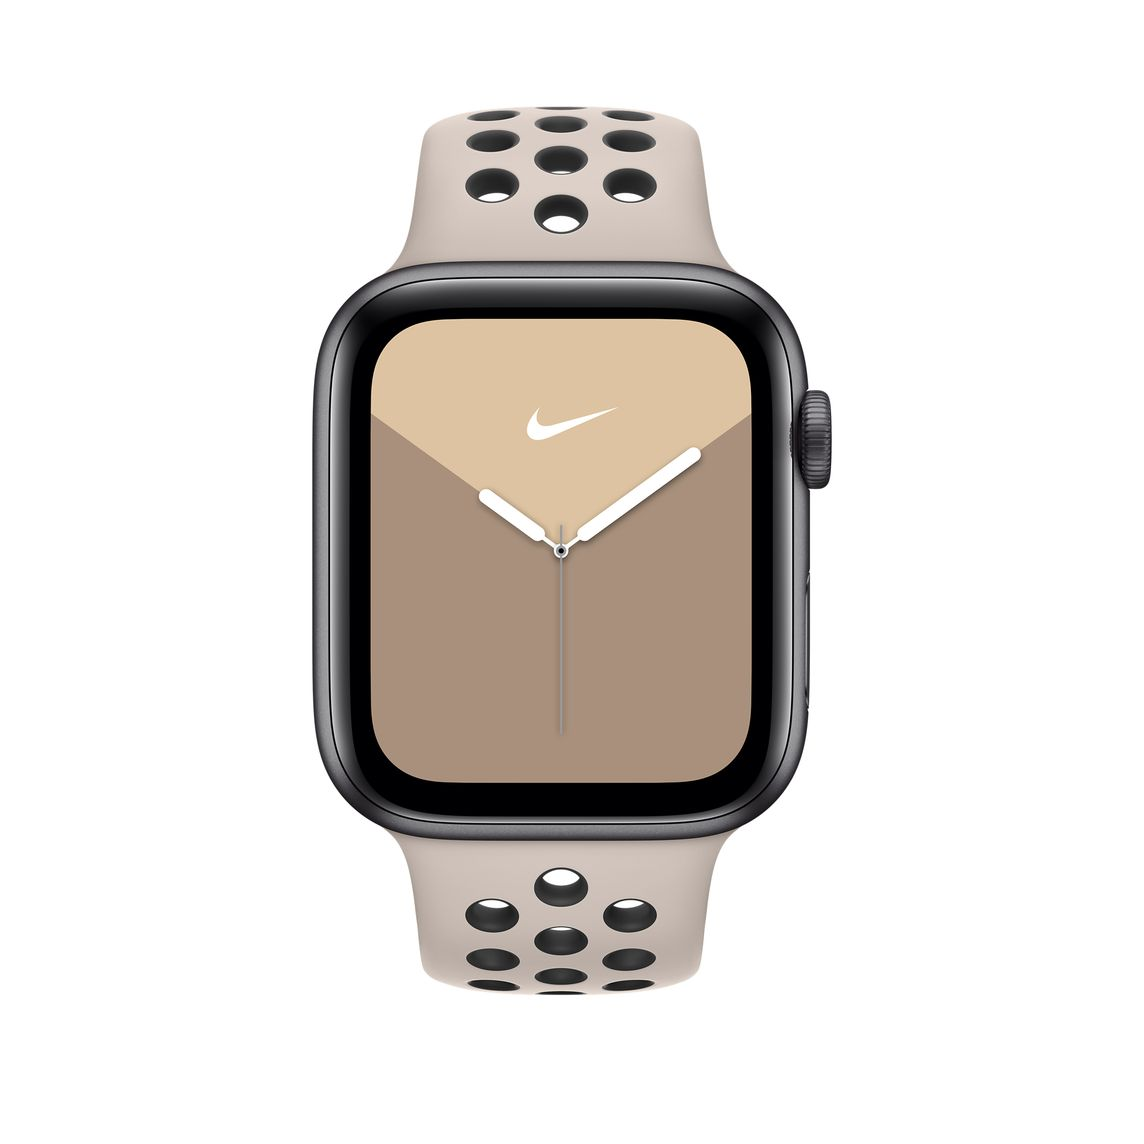 Correa loop deportiva Nike color arena del desiertovolt para caja de 44 mm